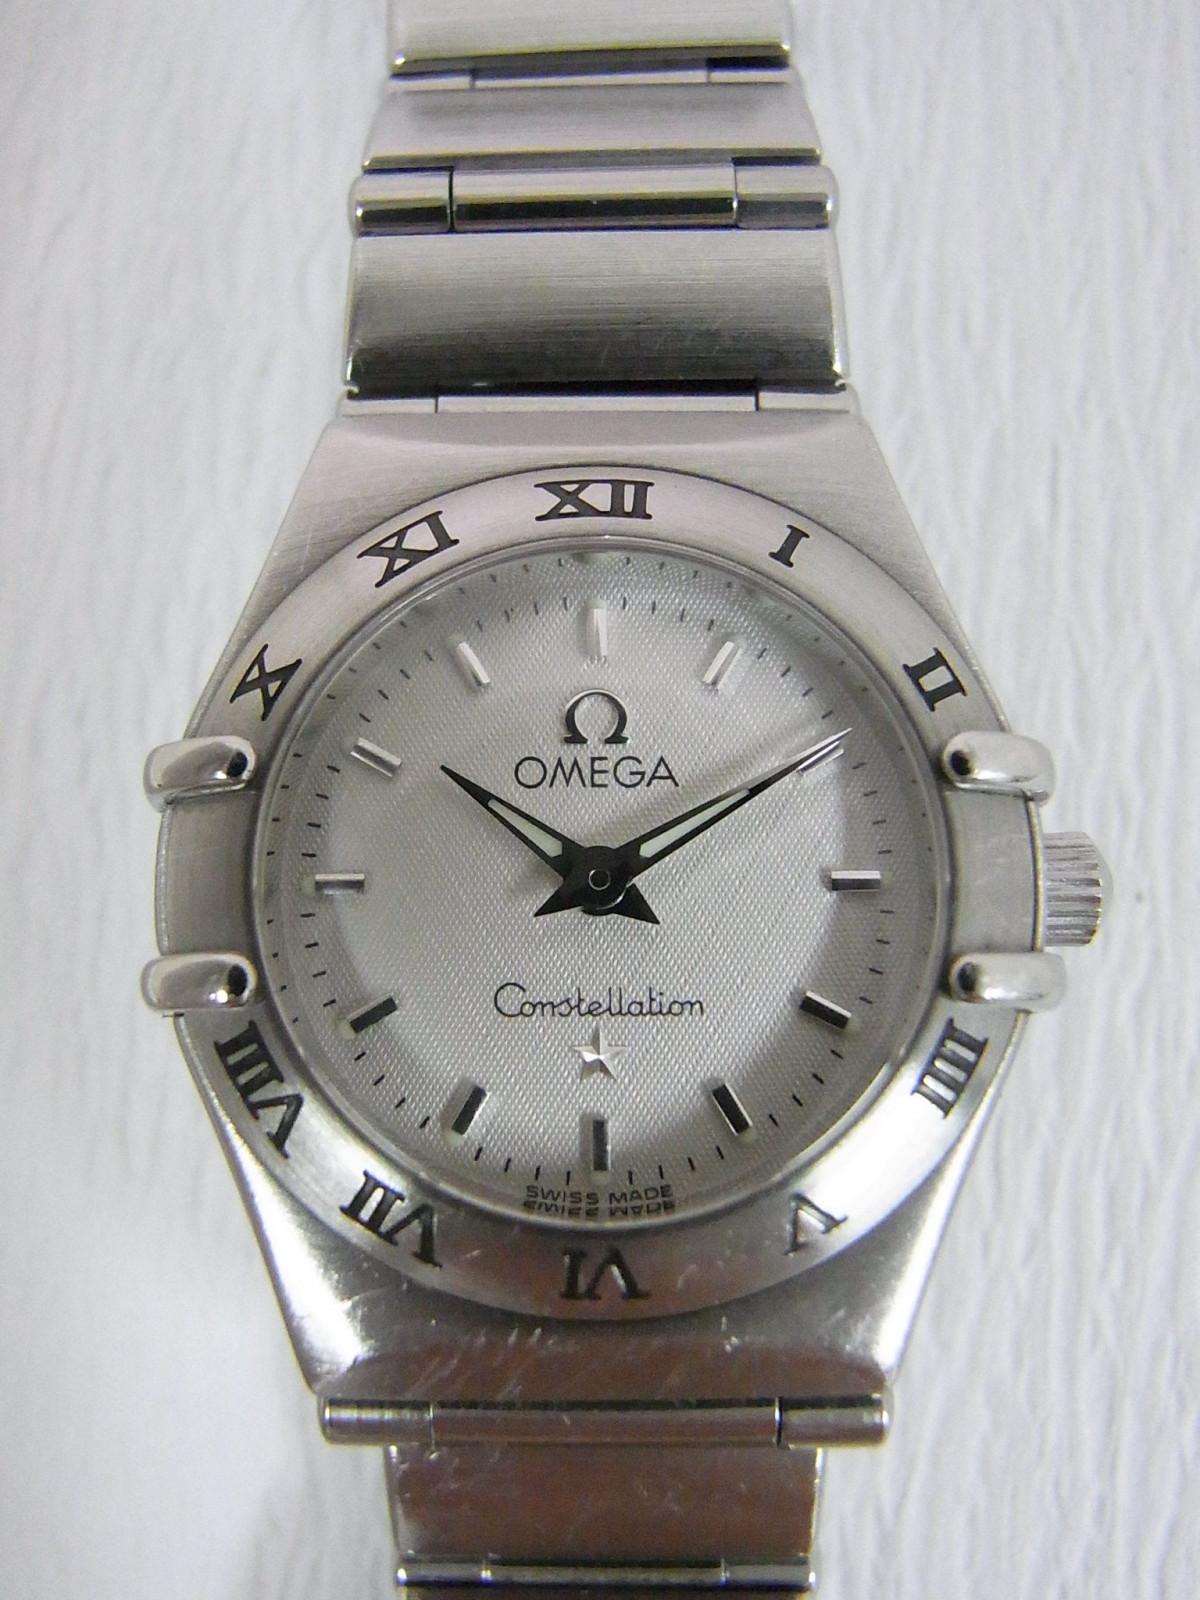 992b6671239 Omega Constellation senhoras  relógio usados (€40) - Timepeaks